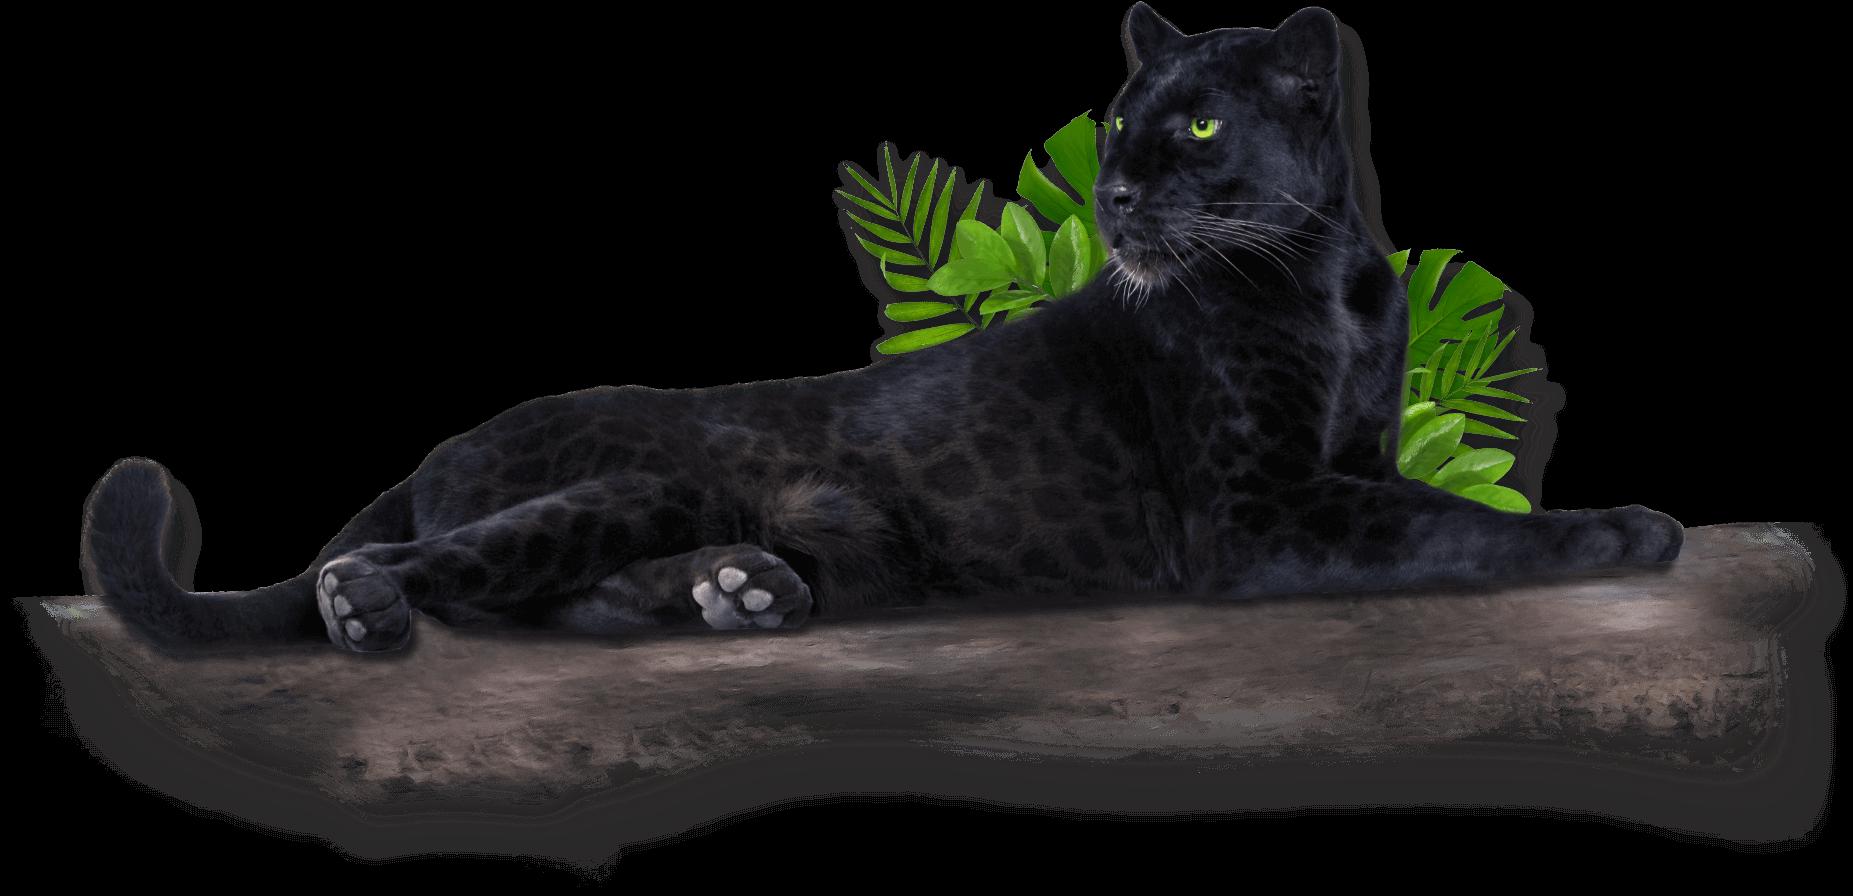 wwf-jaguar